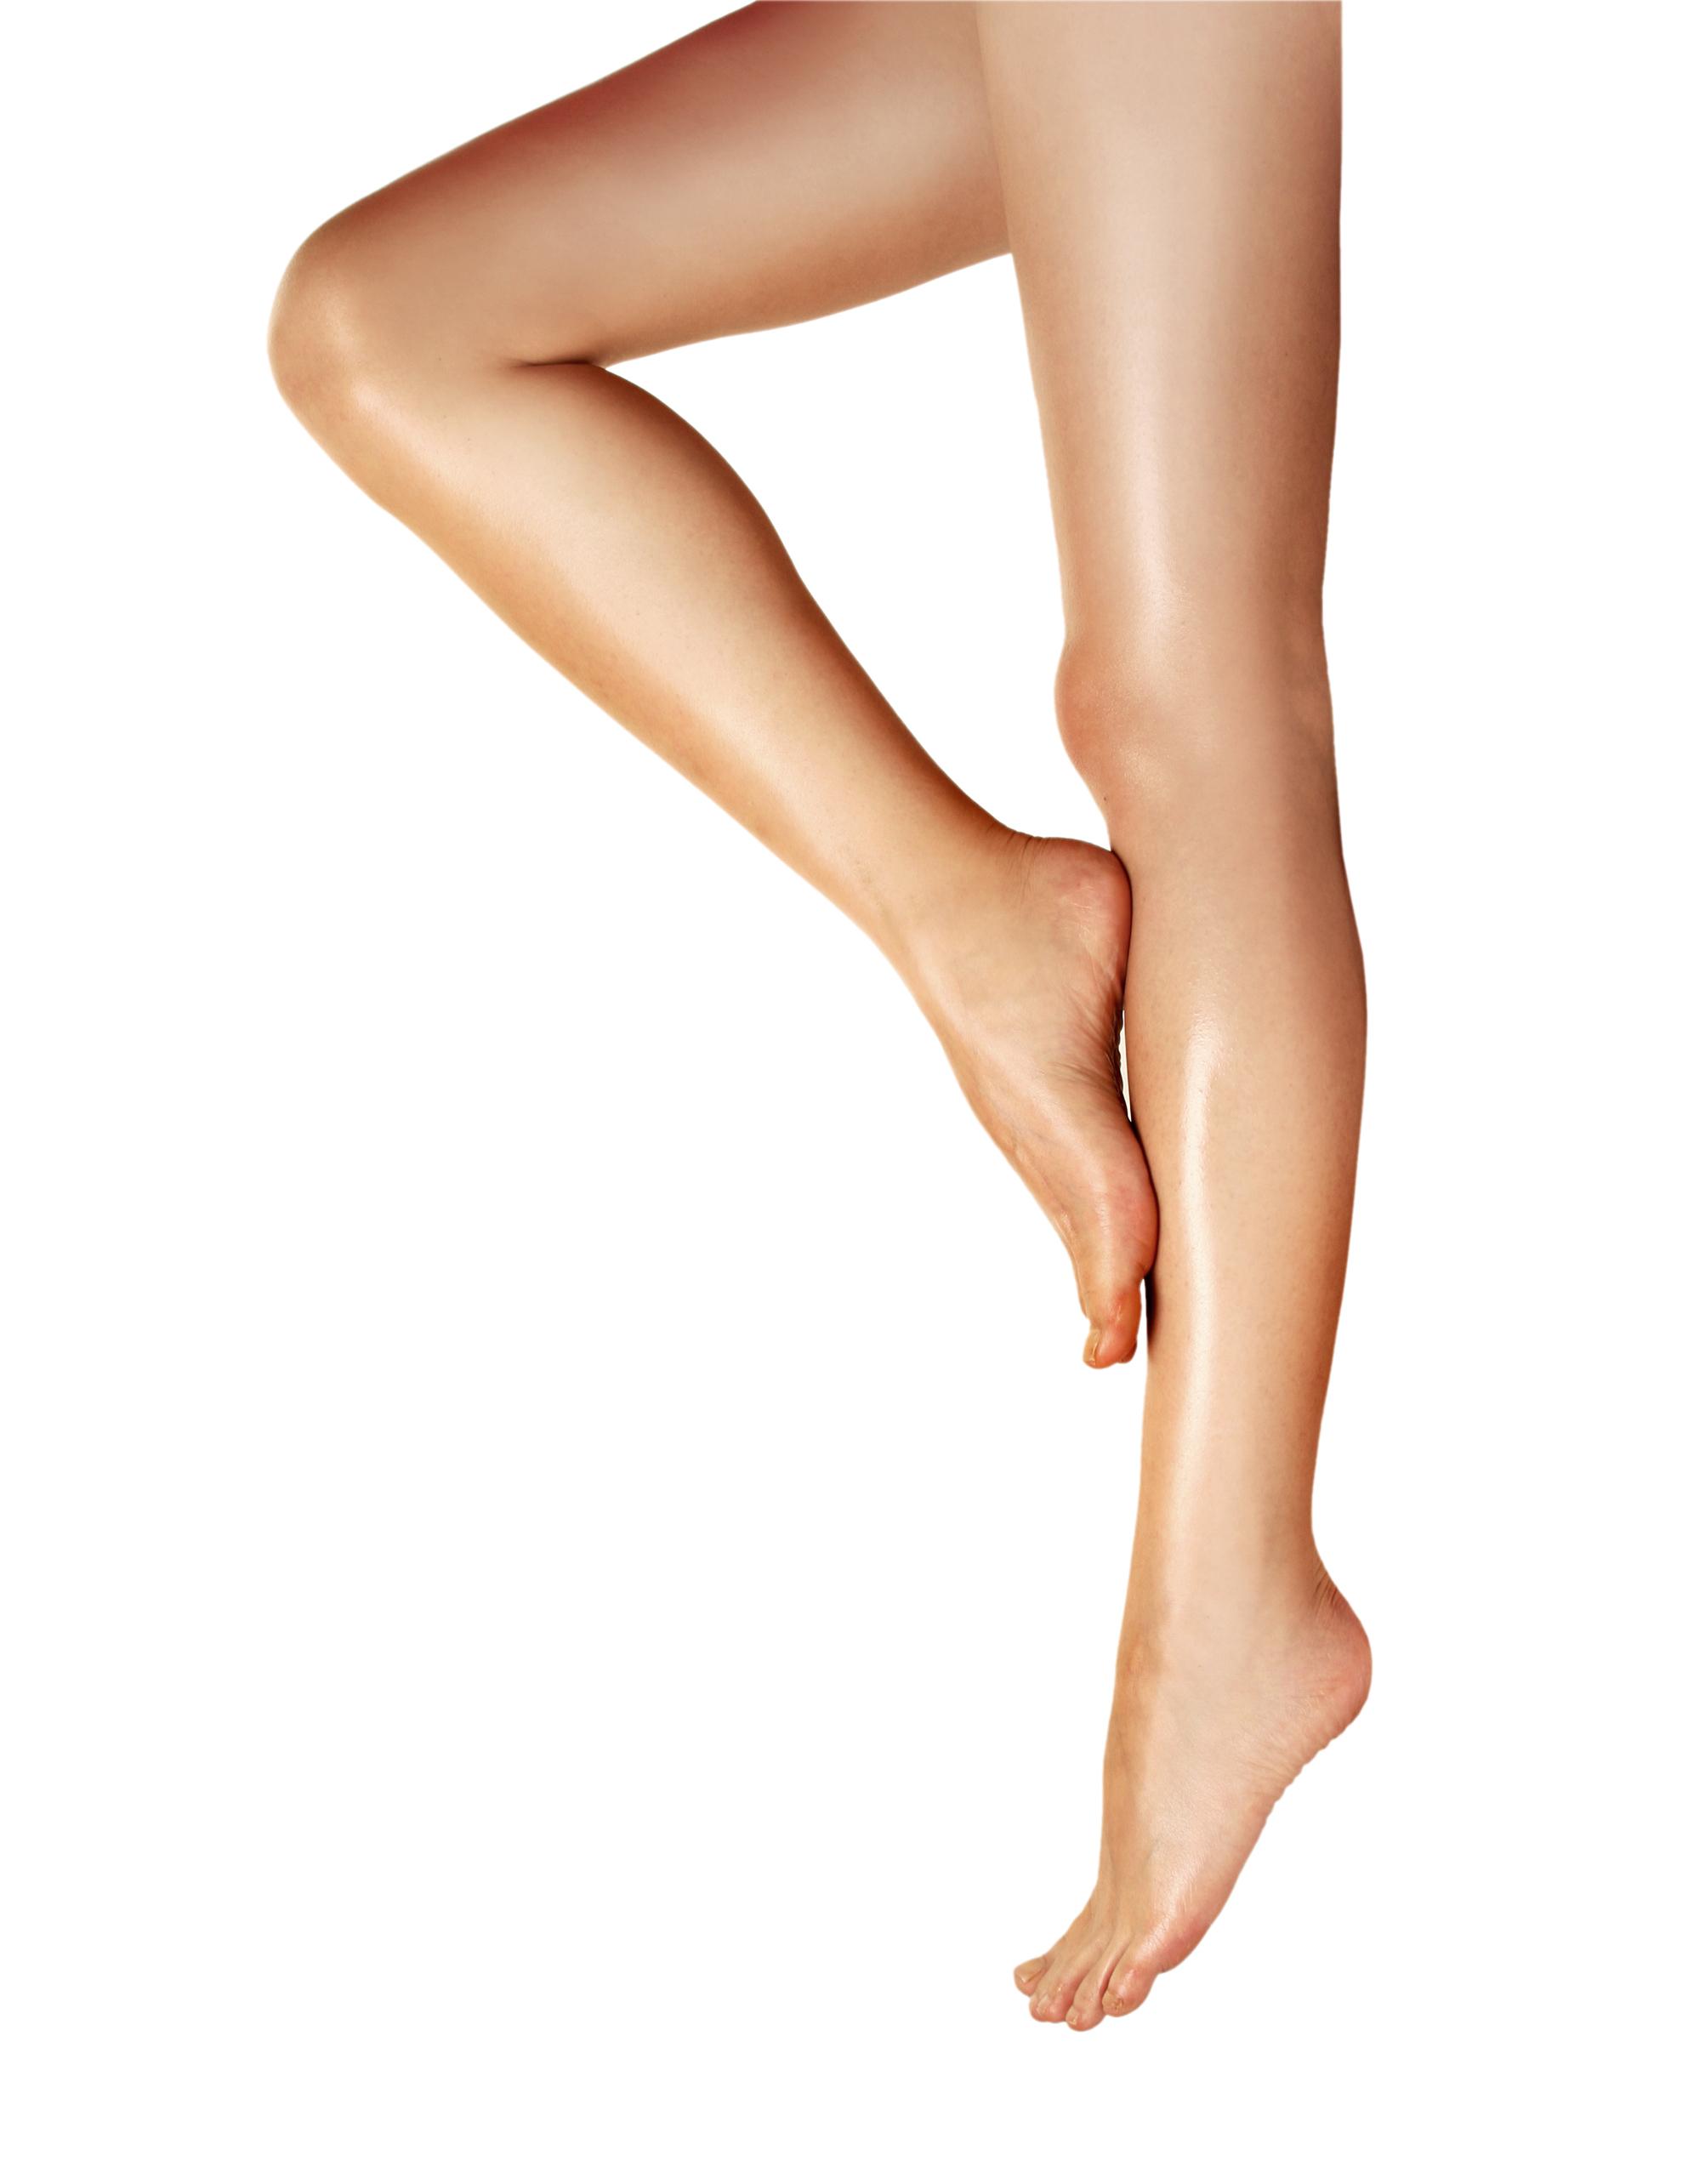 Women legs png image. Leg clipart two